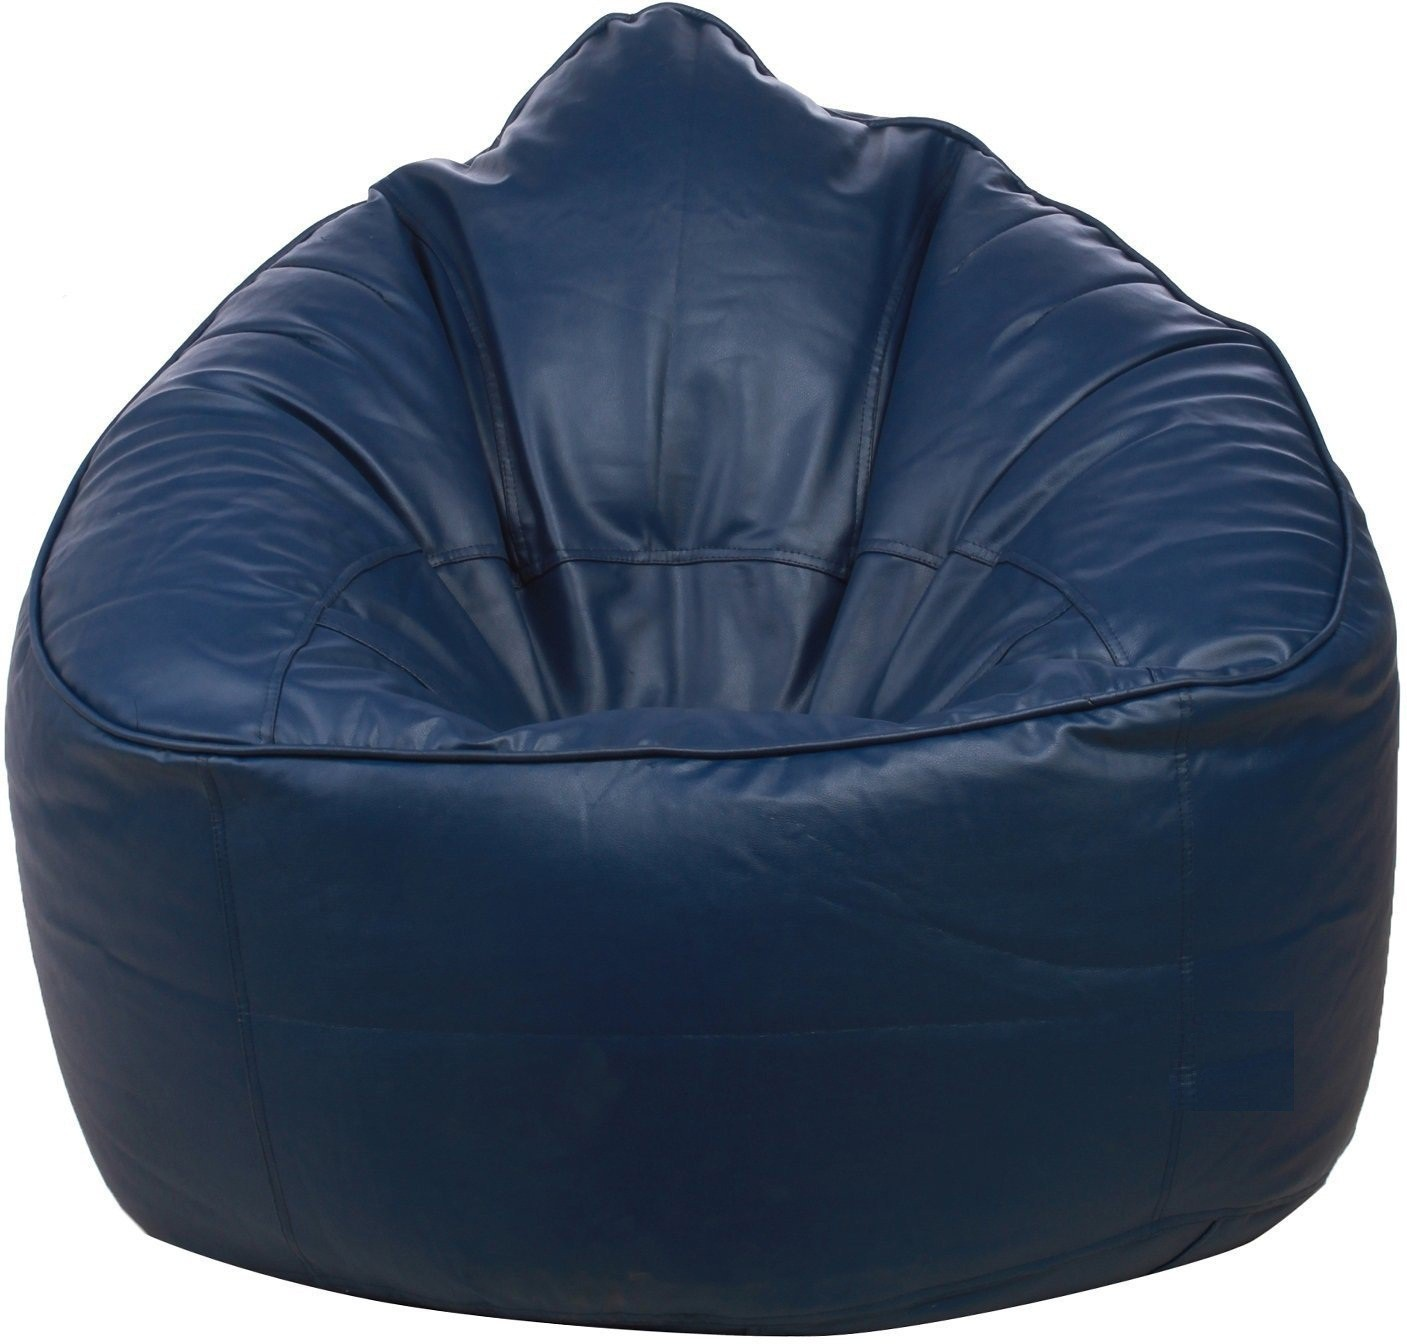 View Ink Craft XXXL Bean Chair Cover(Blue) Furniture (InkCraft)